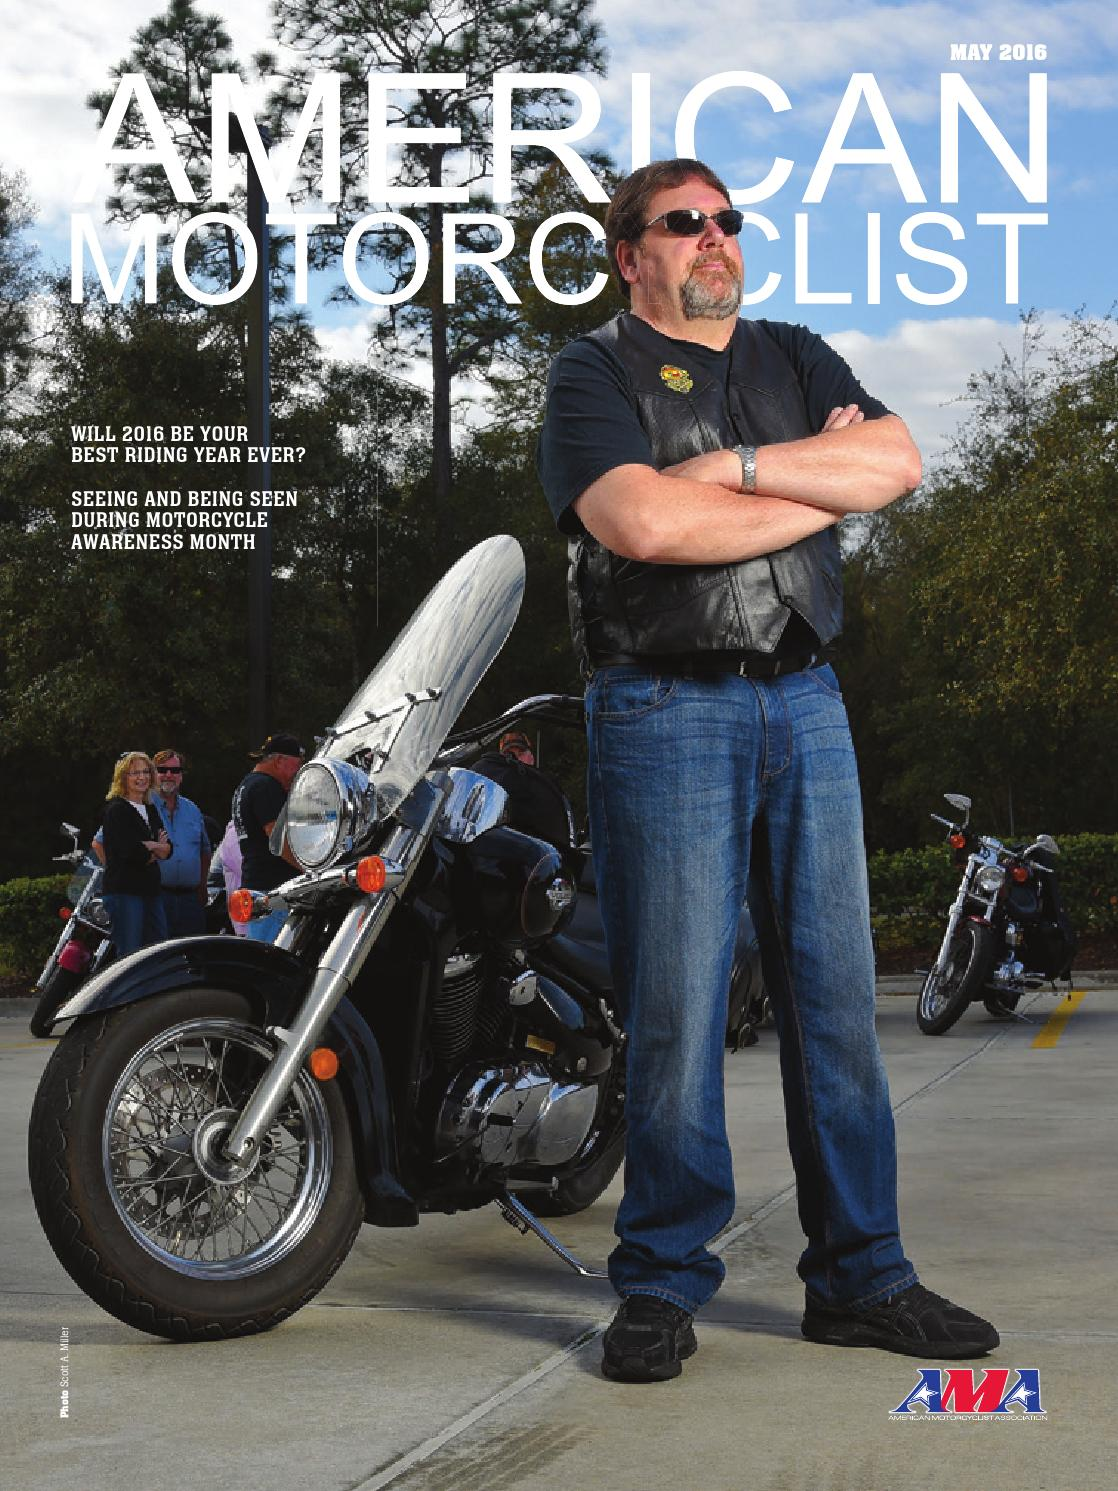 good american motorcyclist #5: American Motorcyclist May 2016 Street by American Motorcyclist Association  - issuu